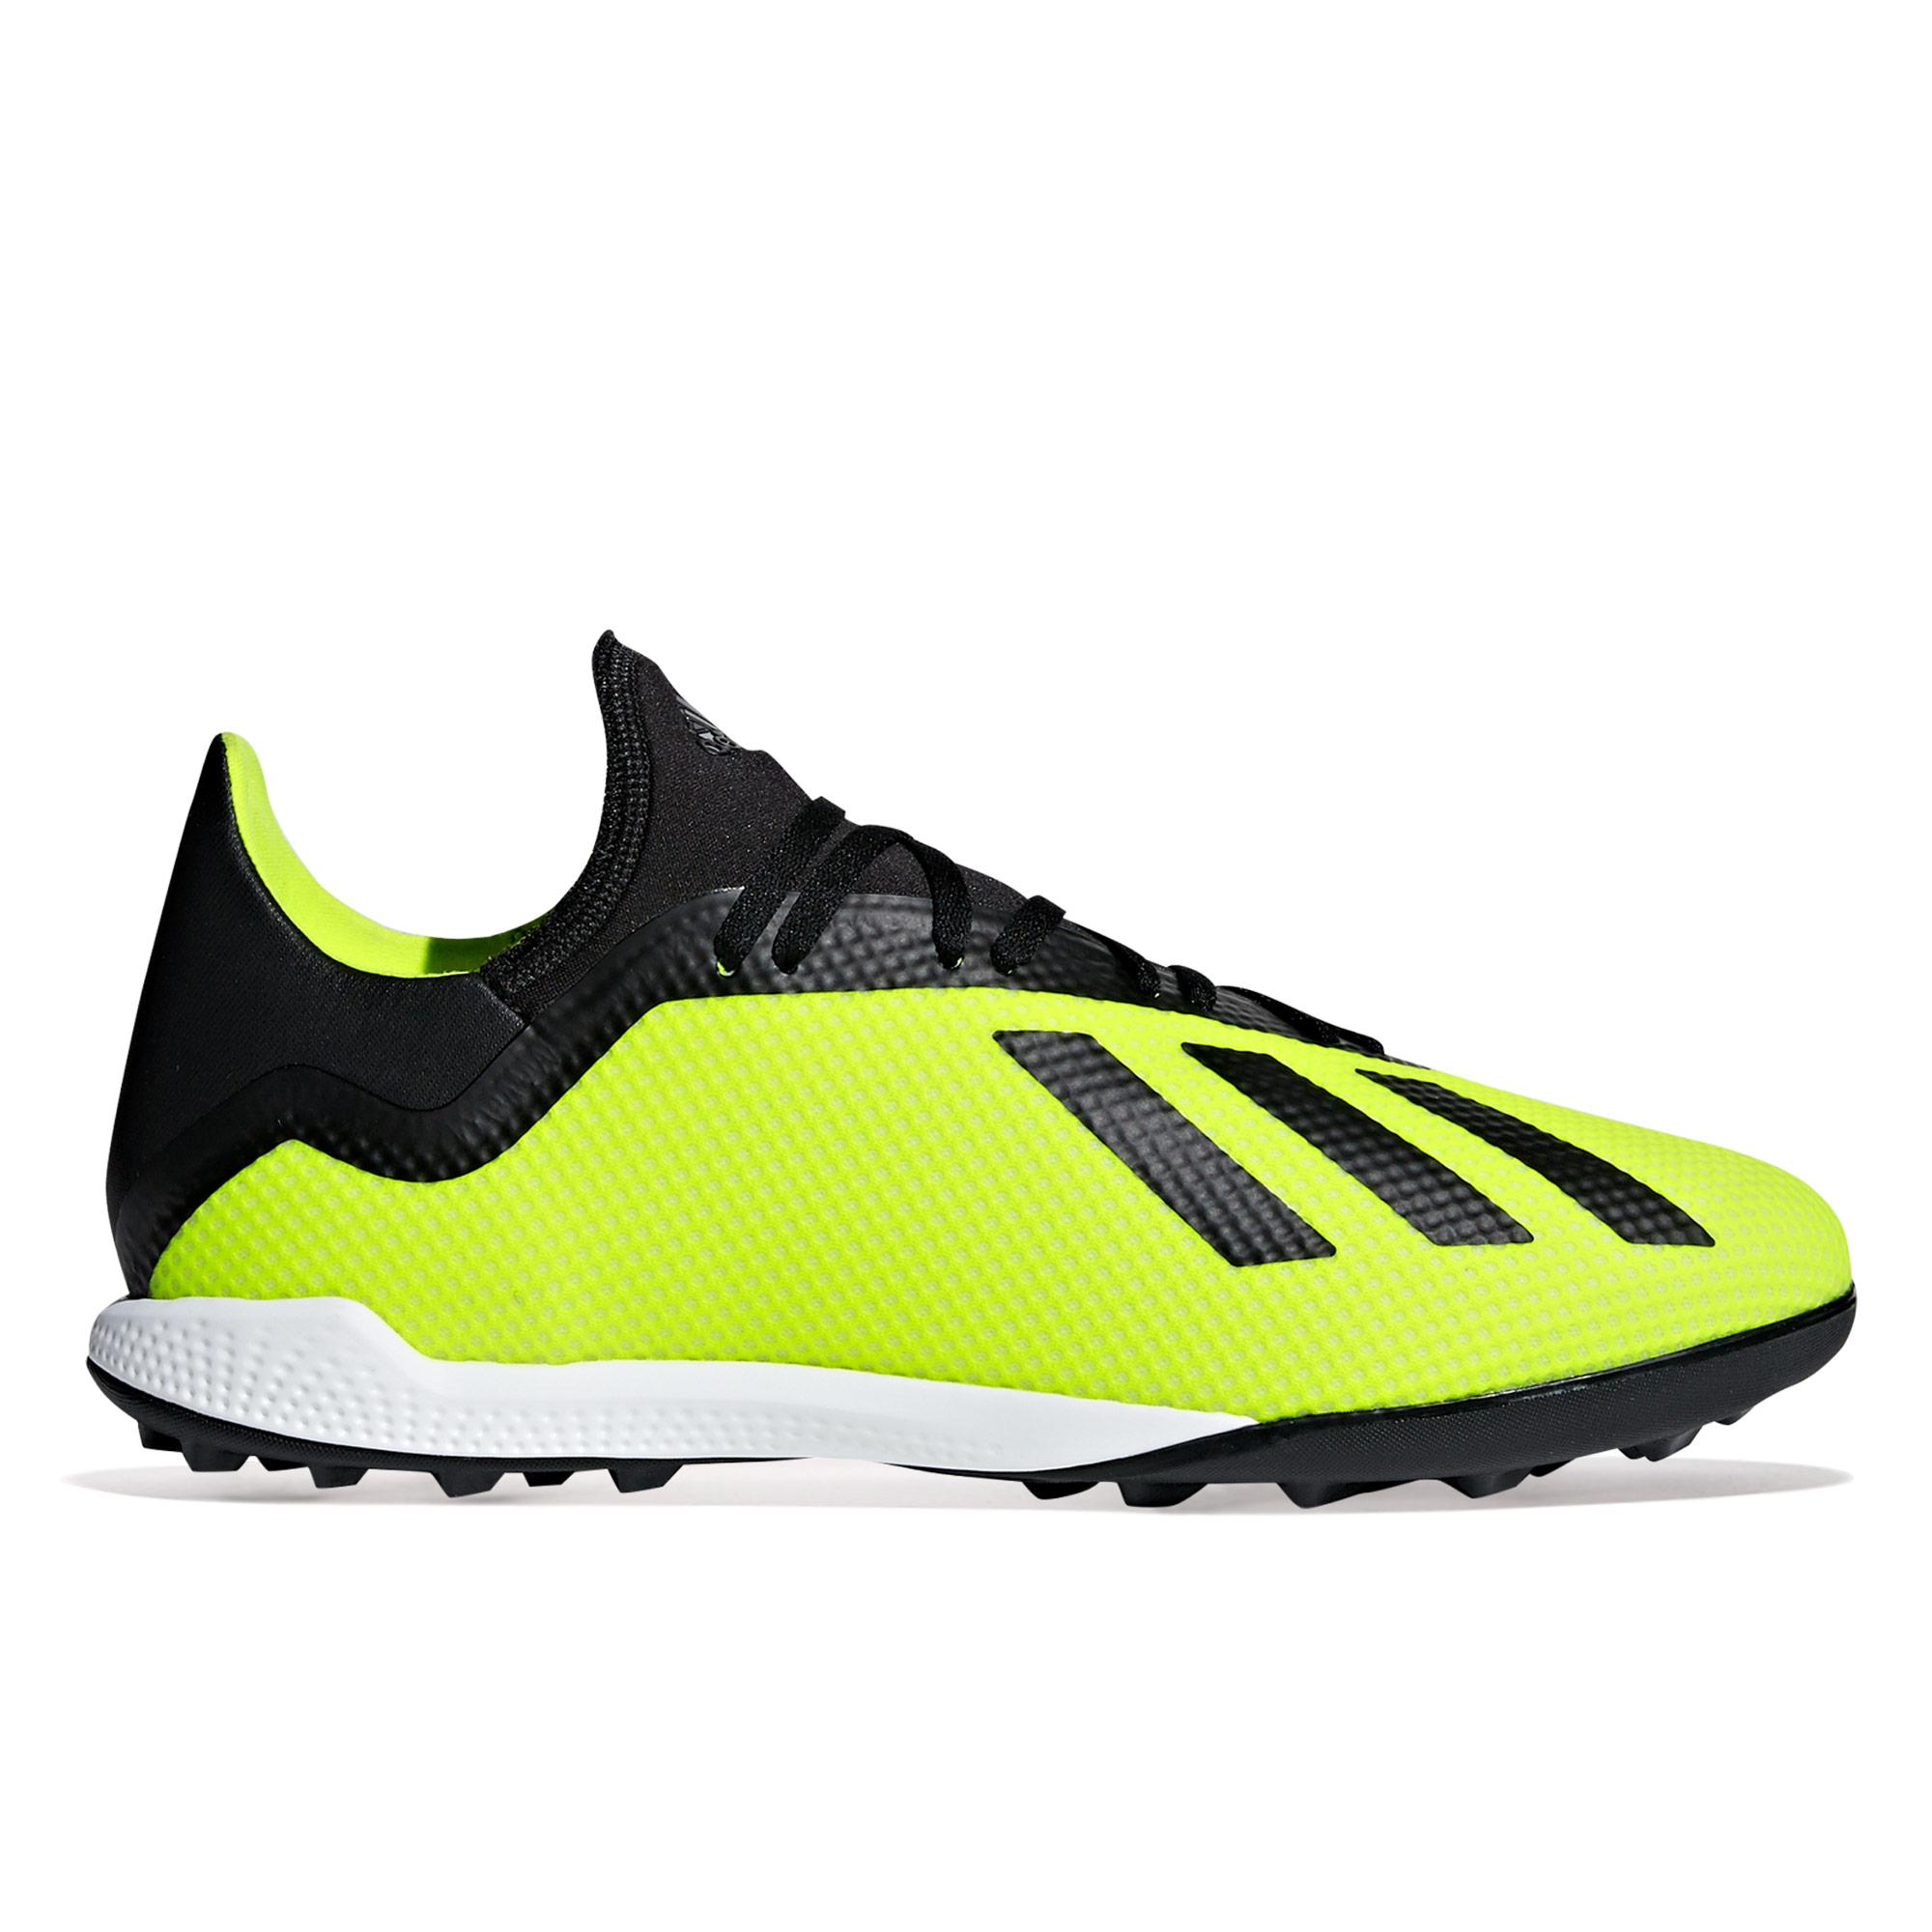 Adidas X Tango 18.3 Astroturf Trainers - Yellow